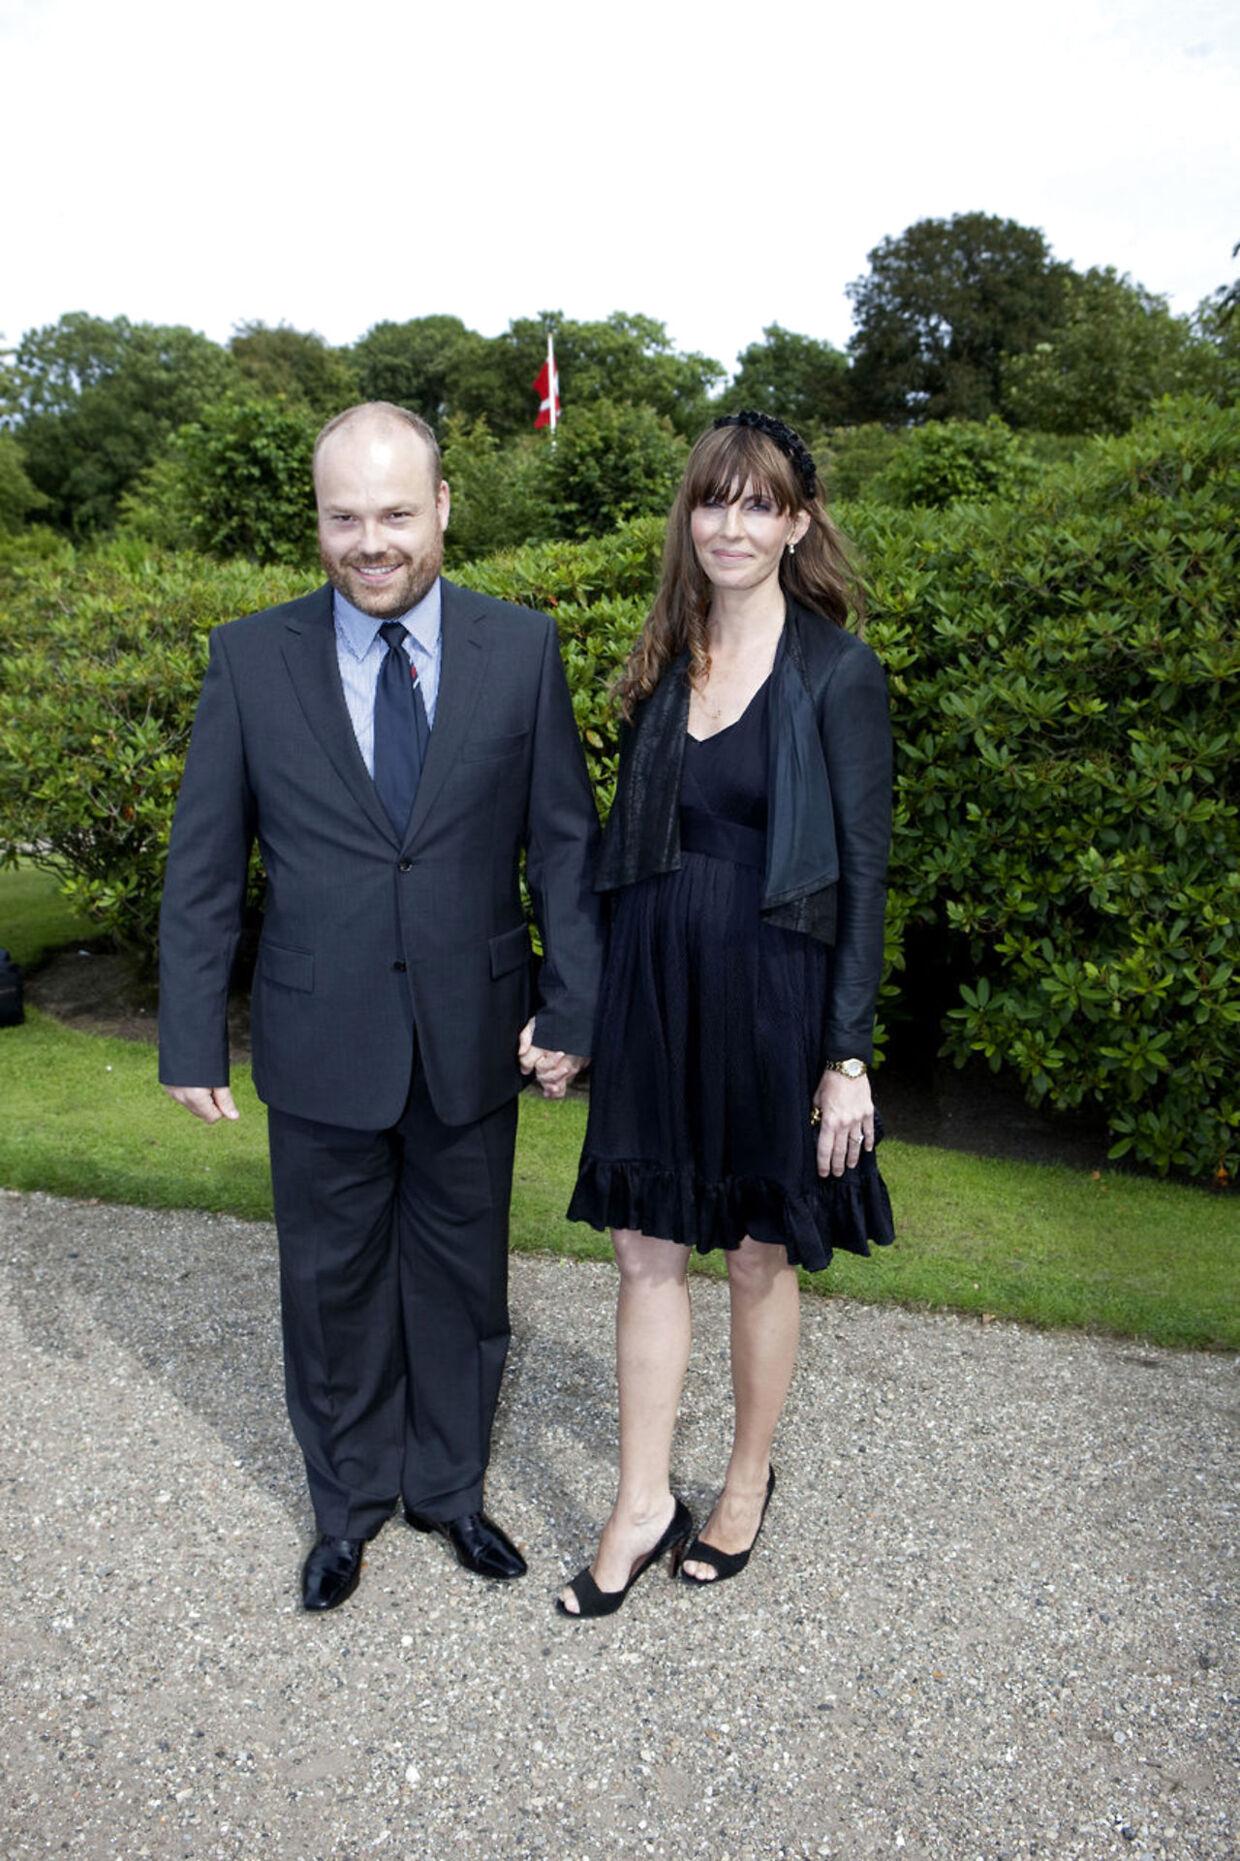 Anders Holch Povlsen ses her med sin kone Anne Storm Pedersen.